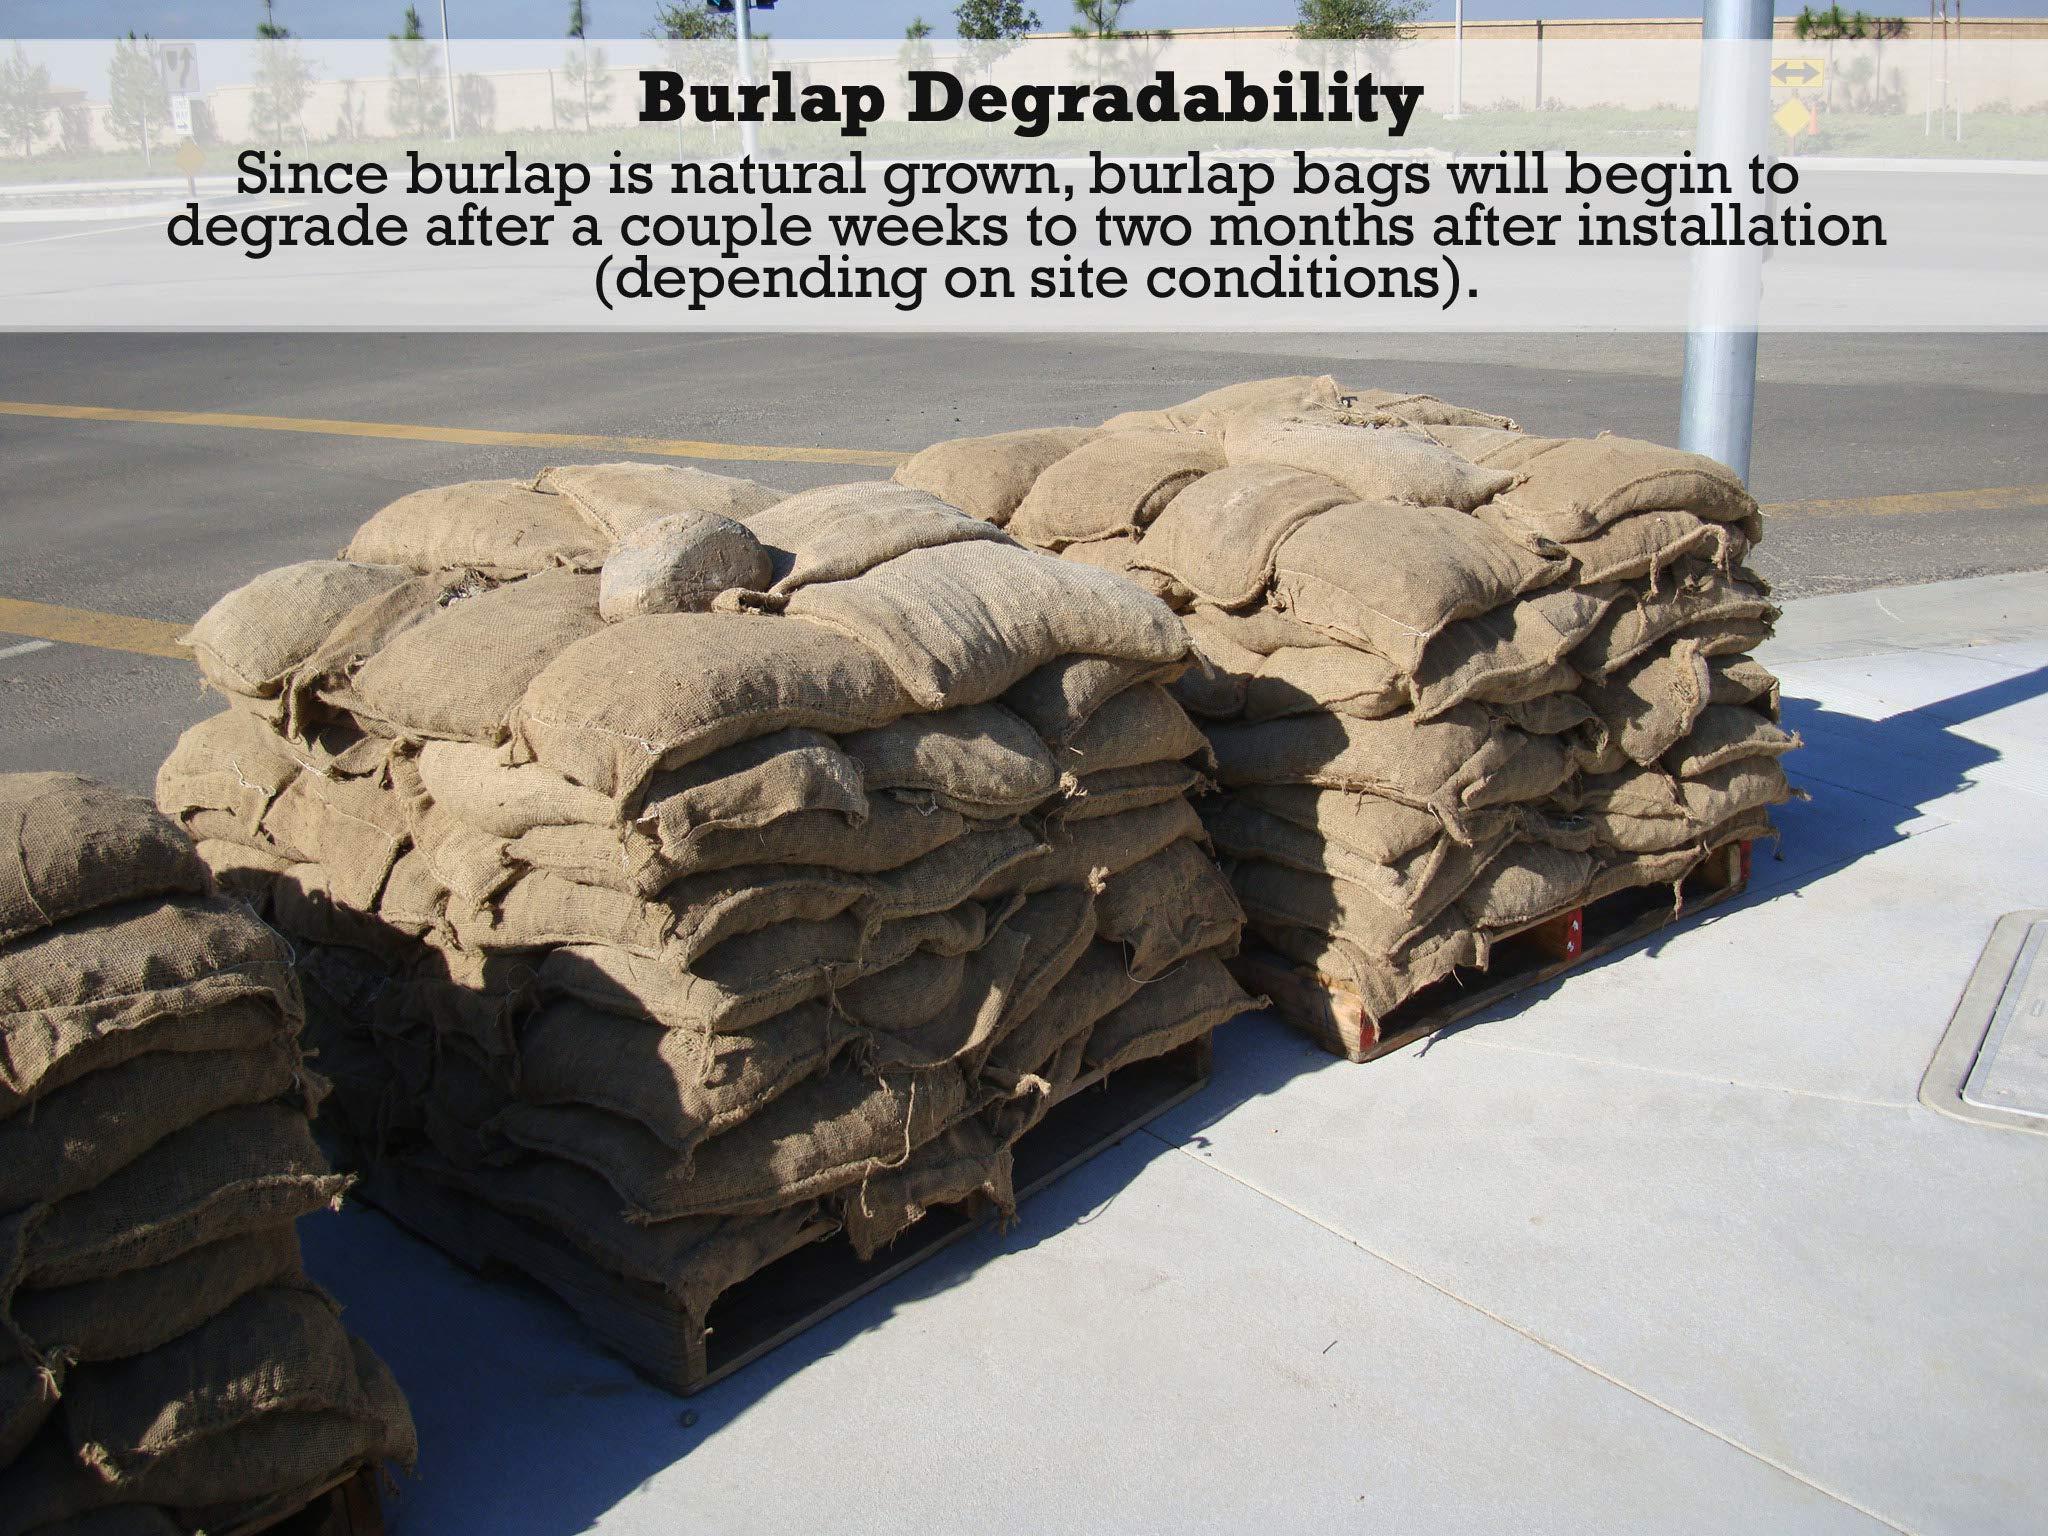 Sandbaggy Burlap Sand Bag - Size: 14'' x 26'' - Sandbags 50lb Weight Capacity - Sandbags for Flooding - Sand Bag - Flood Water Barrier - Water Curb - Tent Sandbags - Store Bags (5 Bags) by Sandbaggy (Image #5)